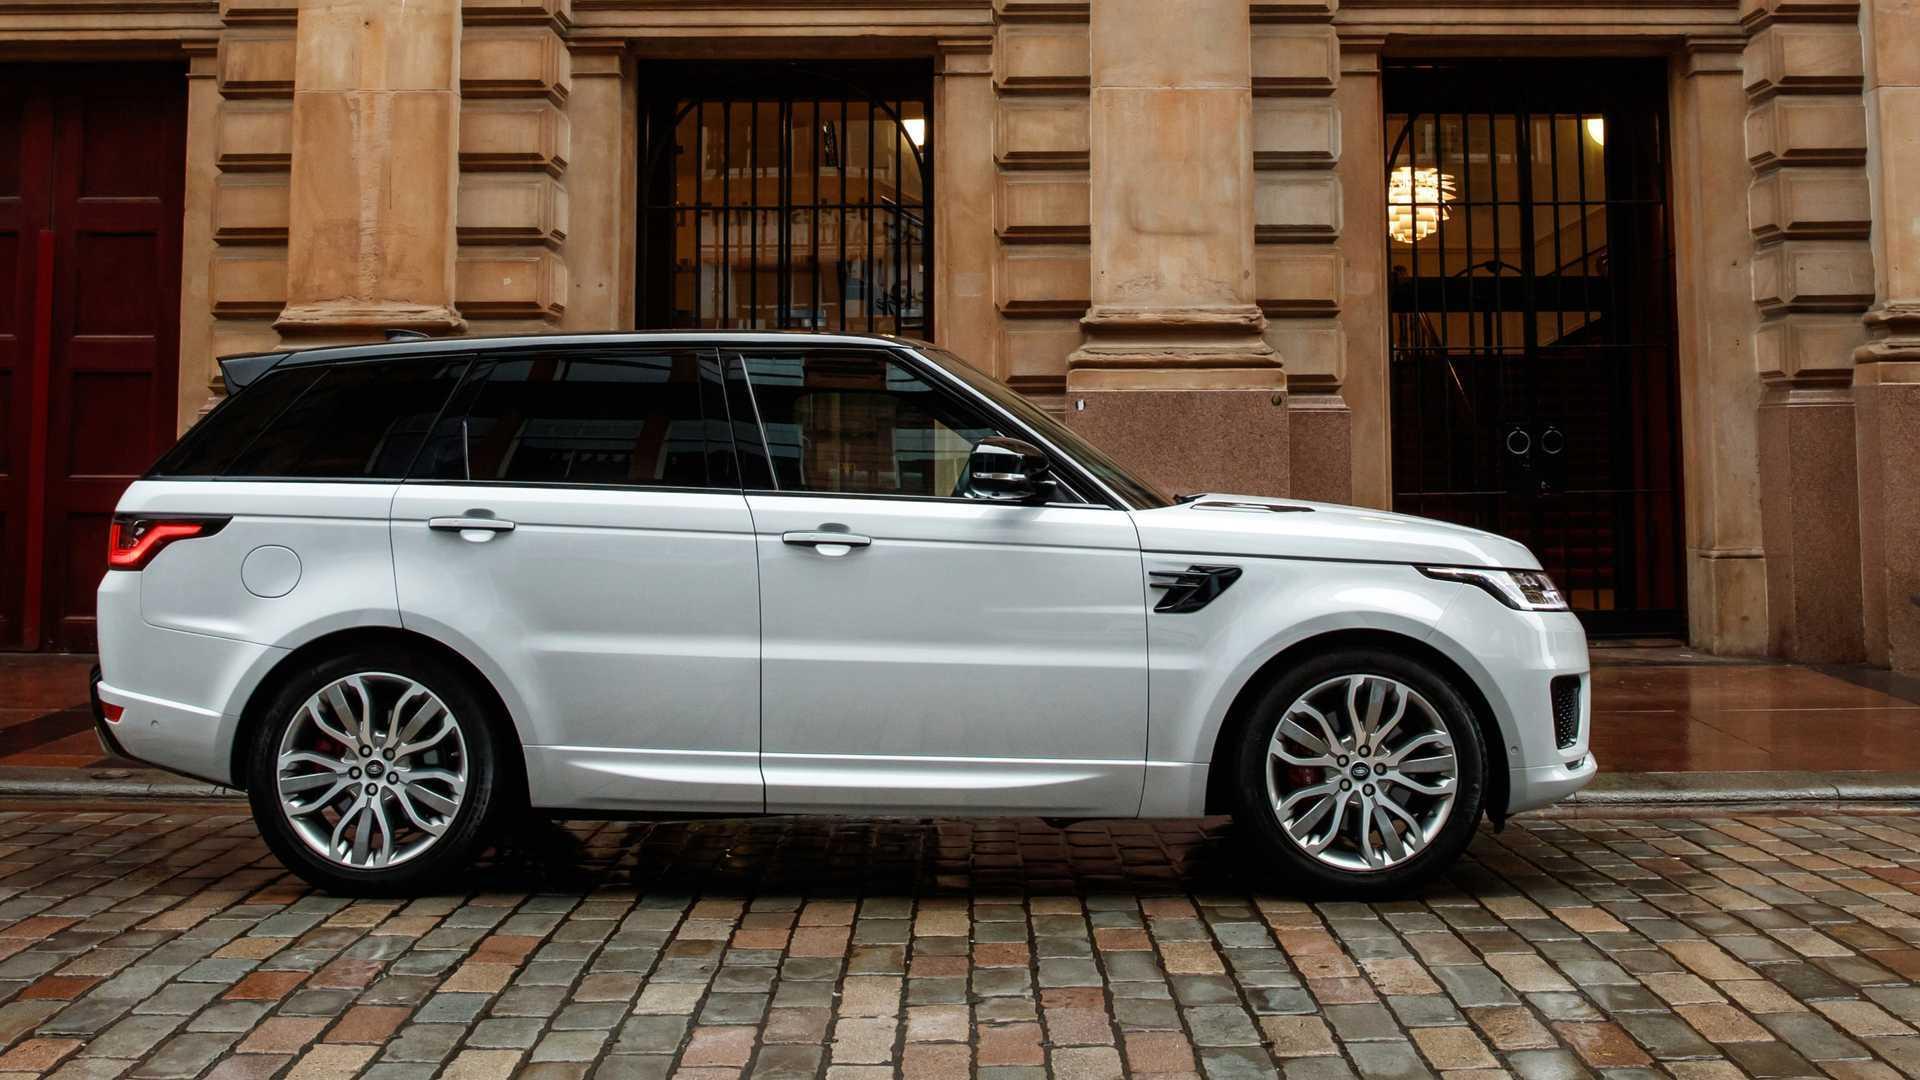 2017 - [Land Rover] Range Rover/ Sport/ SVR restylés - Page 4 Land-rover-range-rover-sport-2021